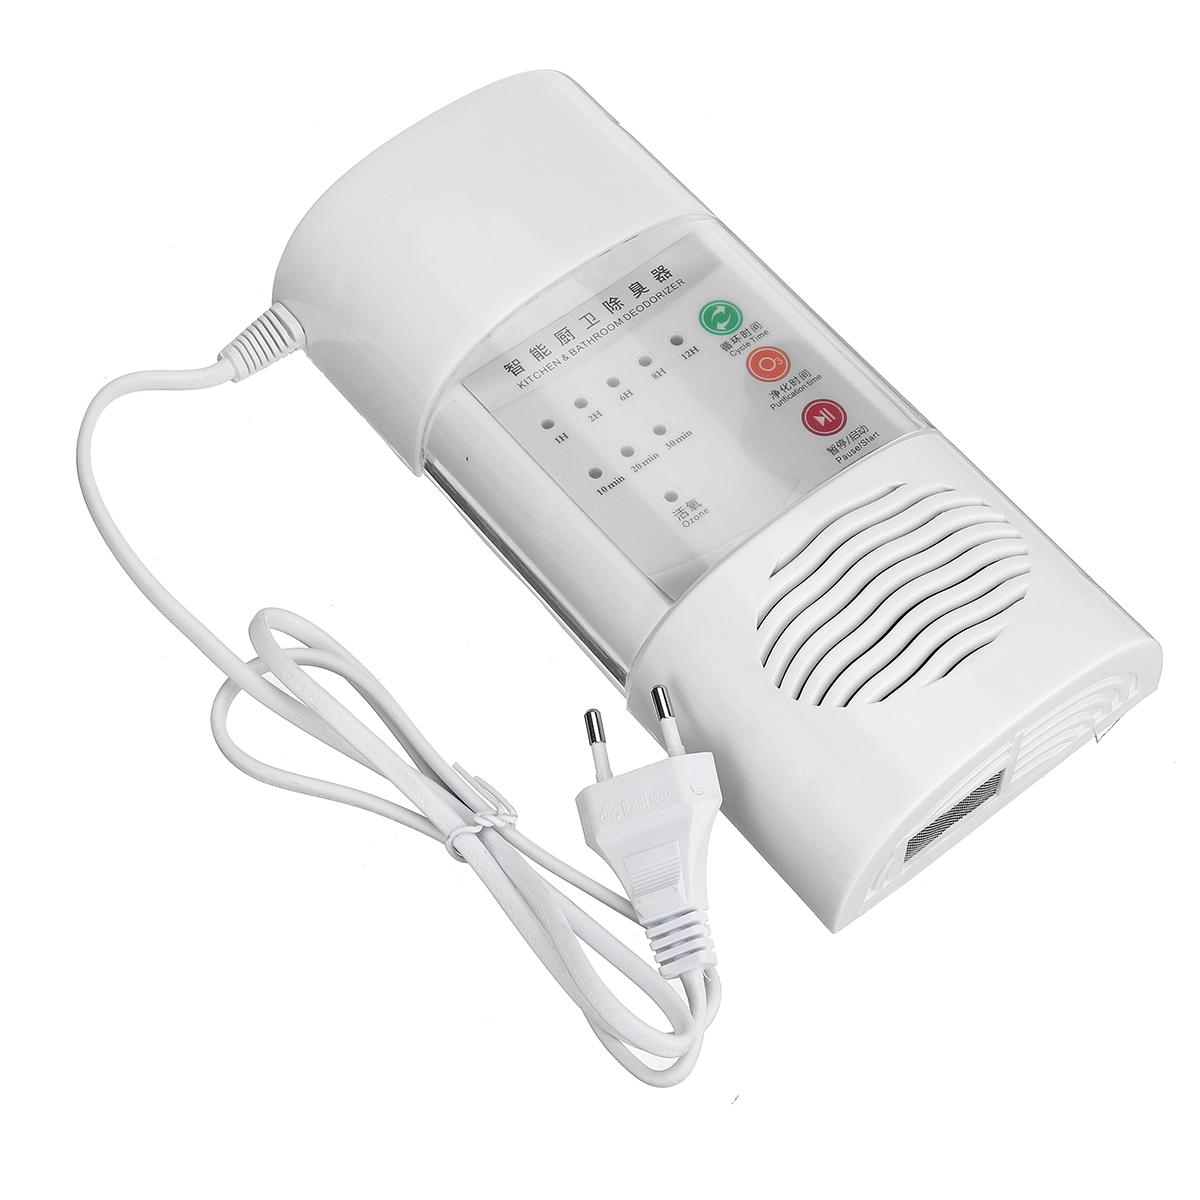 Air Freshener Home Ozone Generator Breath Purifier For Home Bathroom Deodorizing Tool